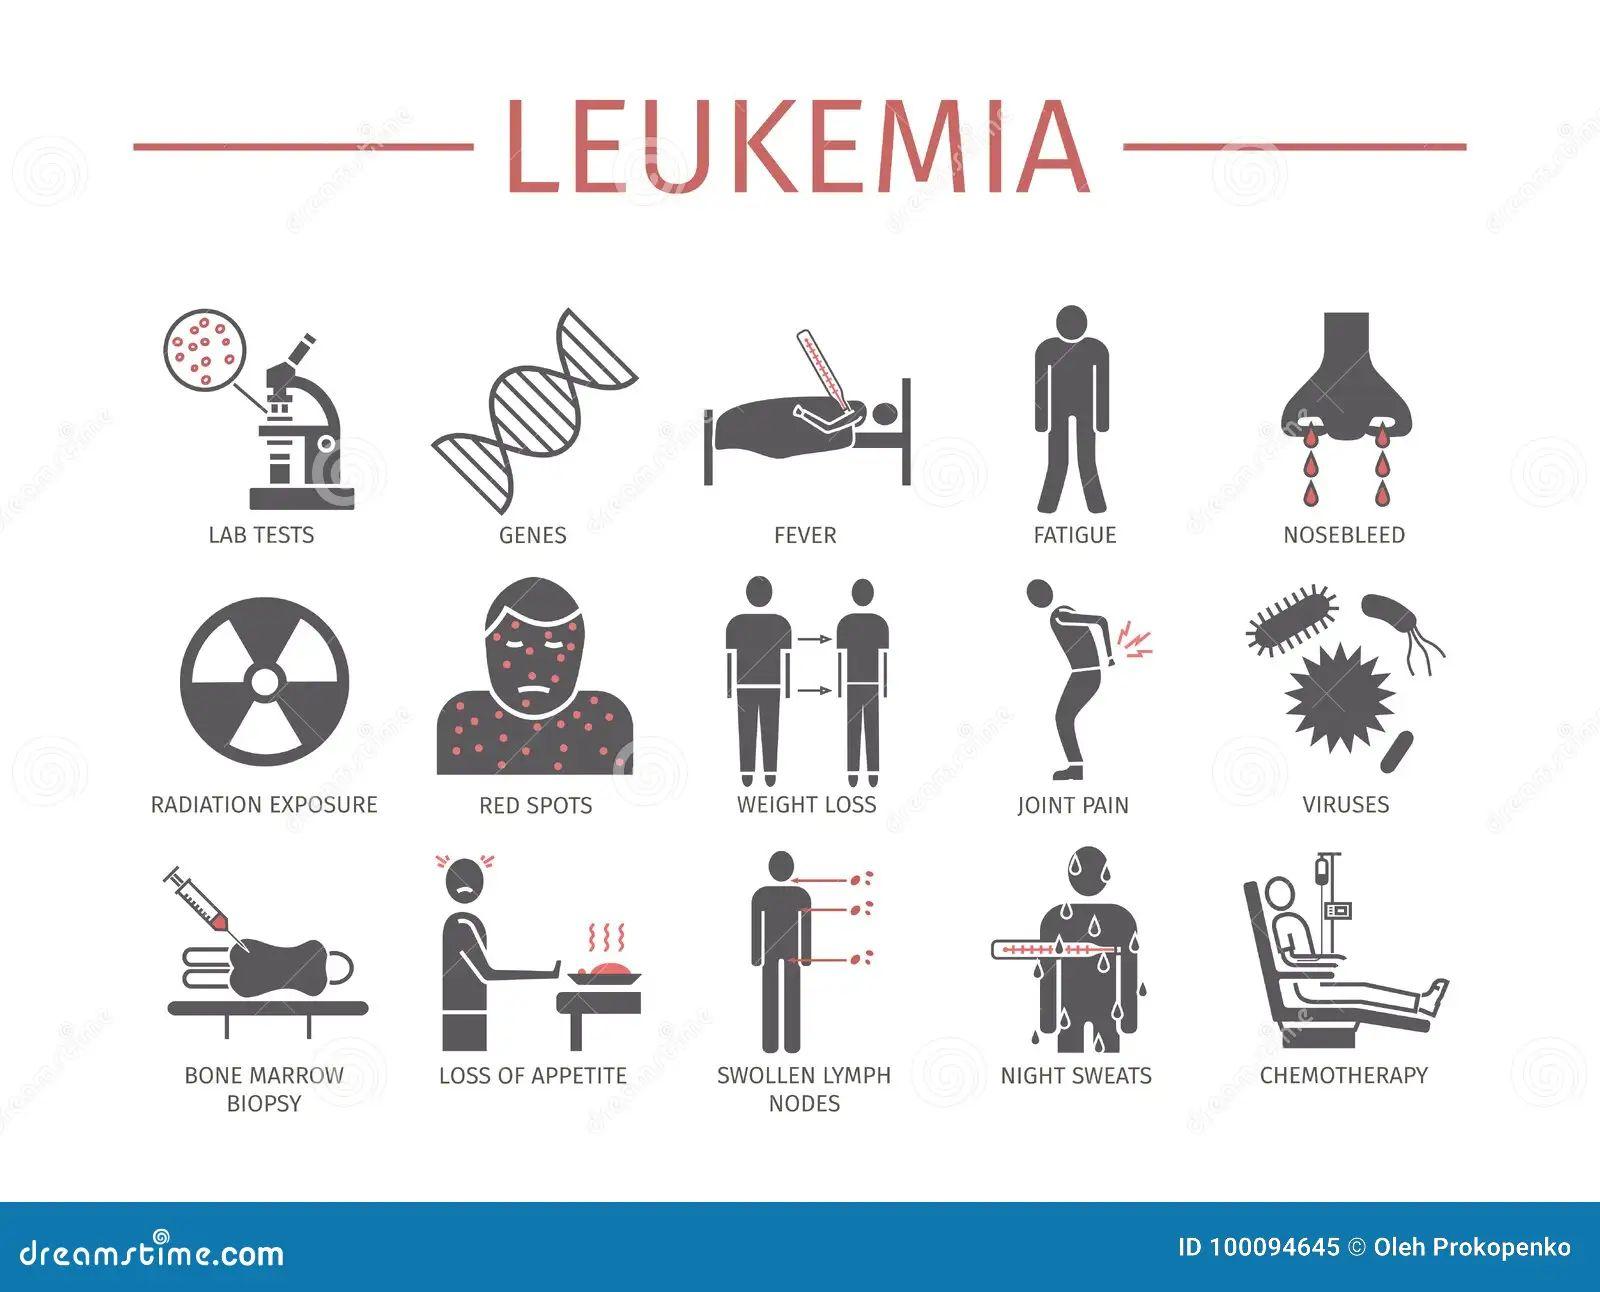 lymphoma cancer diagrams